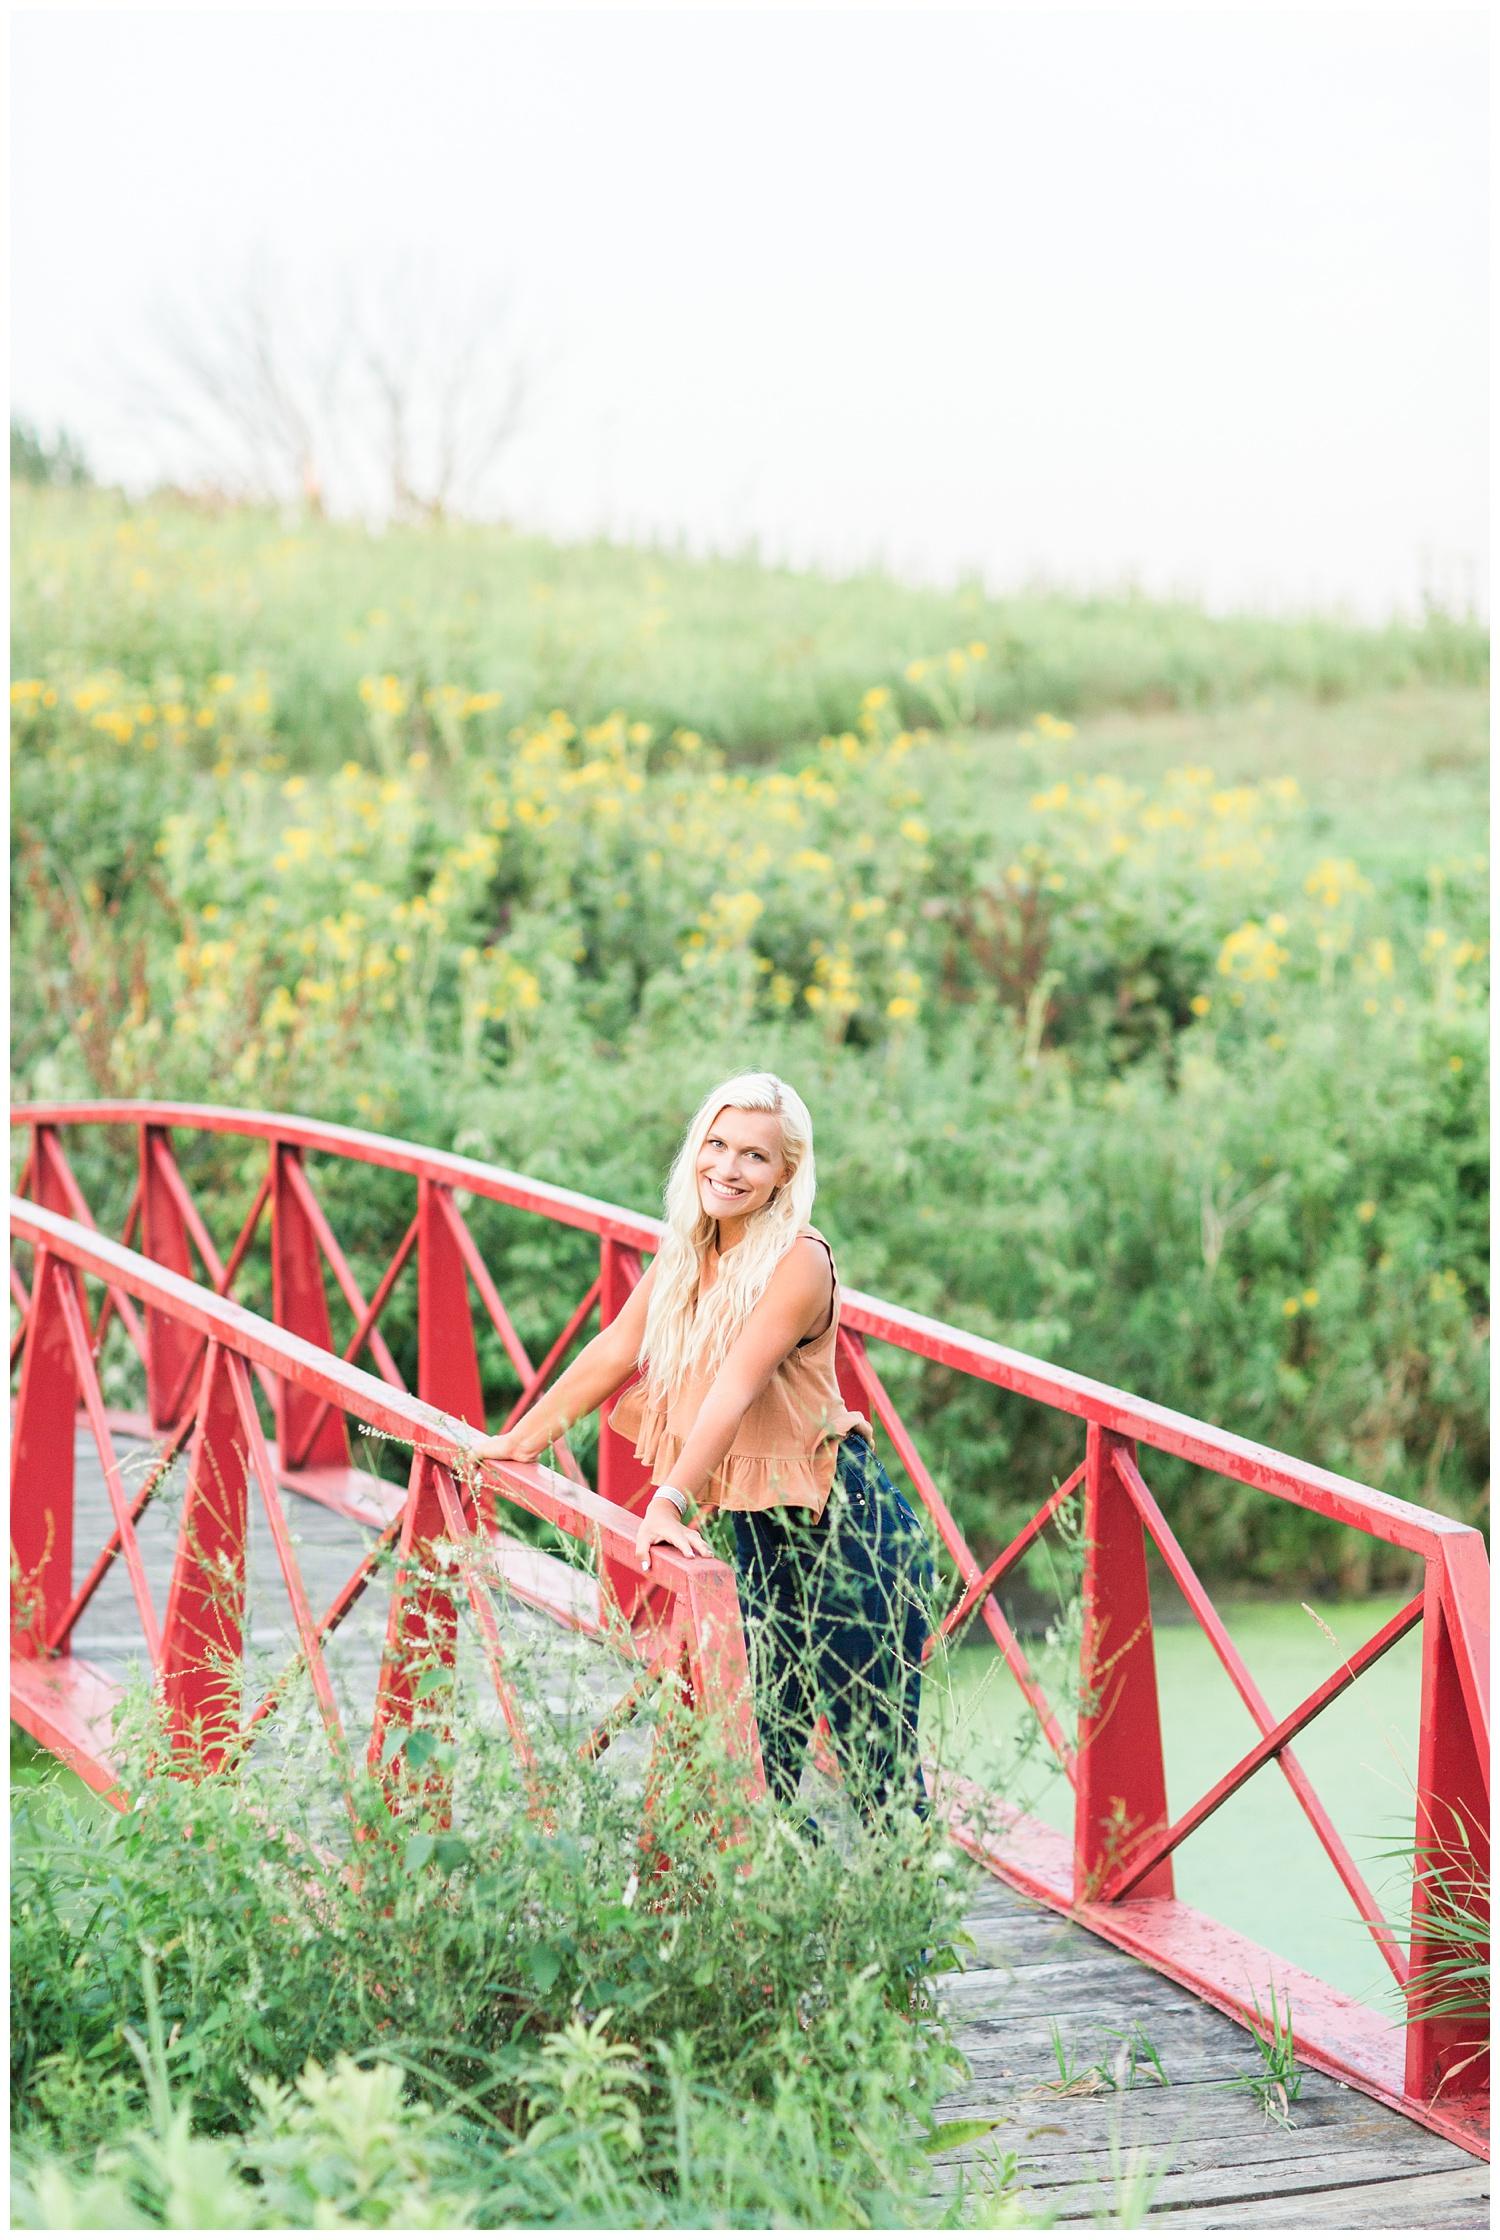 Senior girl standing on a red bridge at Water's Edge Nature Center in Algona, Iowa | CB Studio